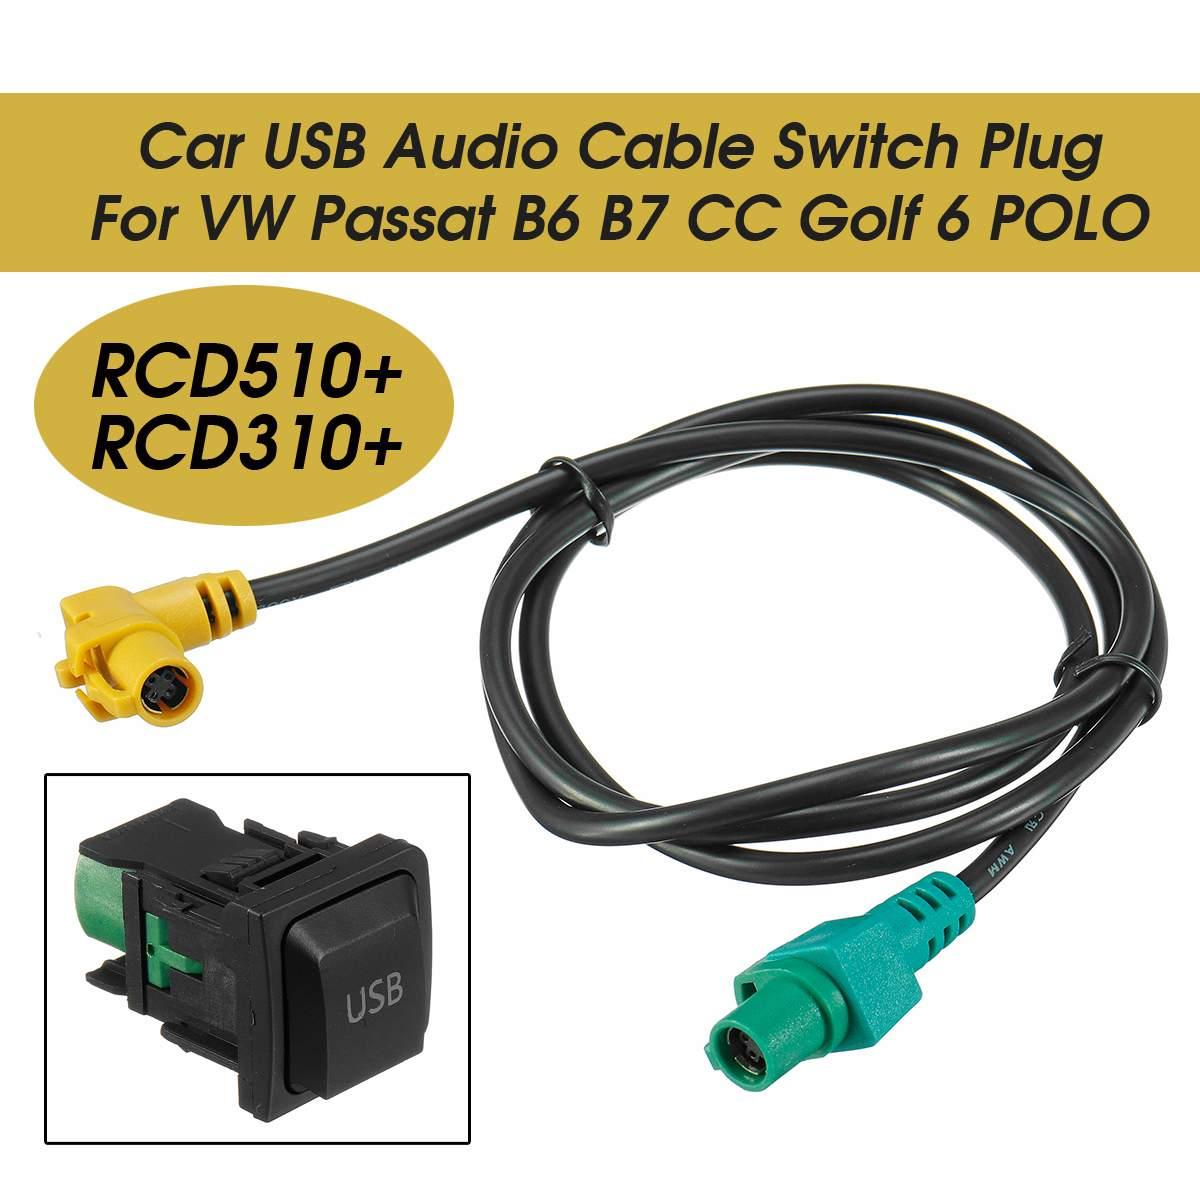 3 Style RCD510+ RCD310+ Socket Car USB Audio Cable Switch Plug for VW Passat B6 B7 CC Car Electronics Accessories